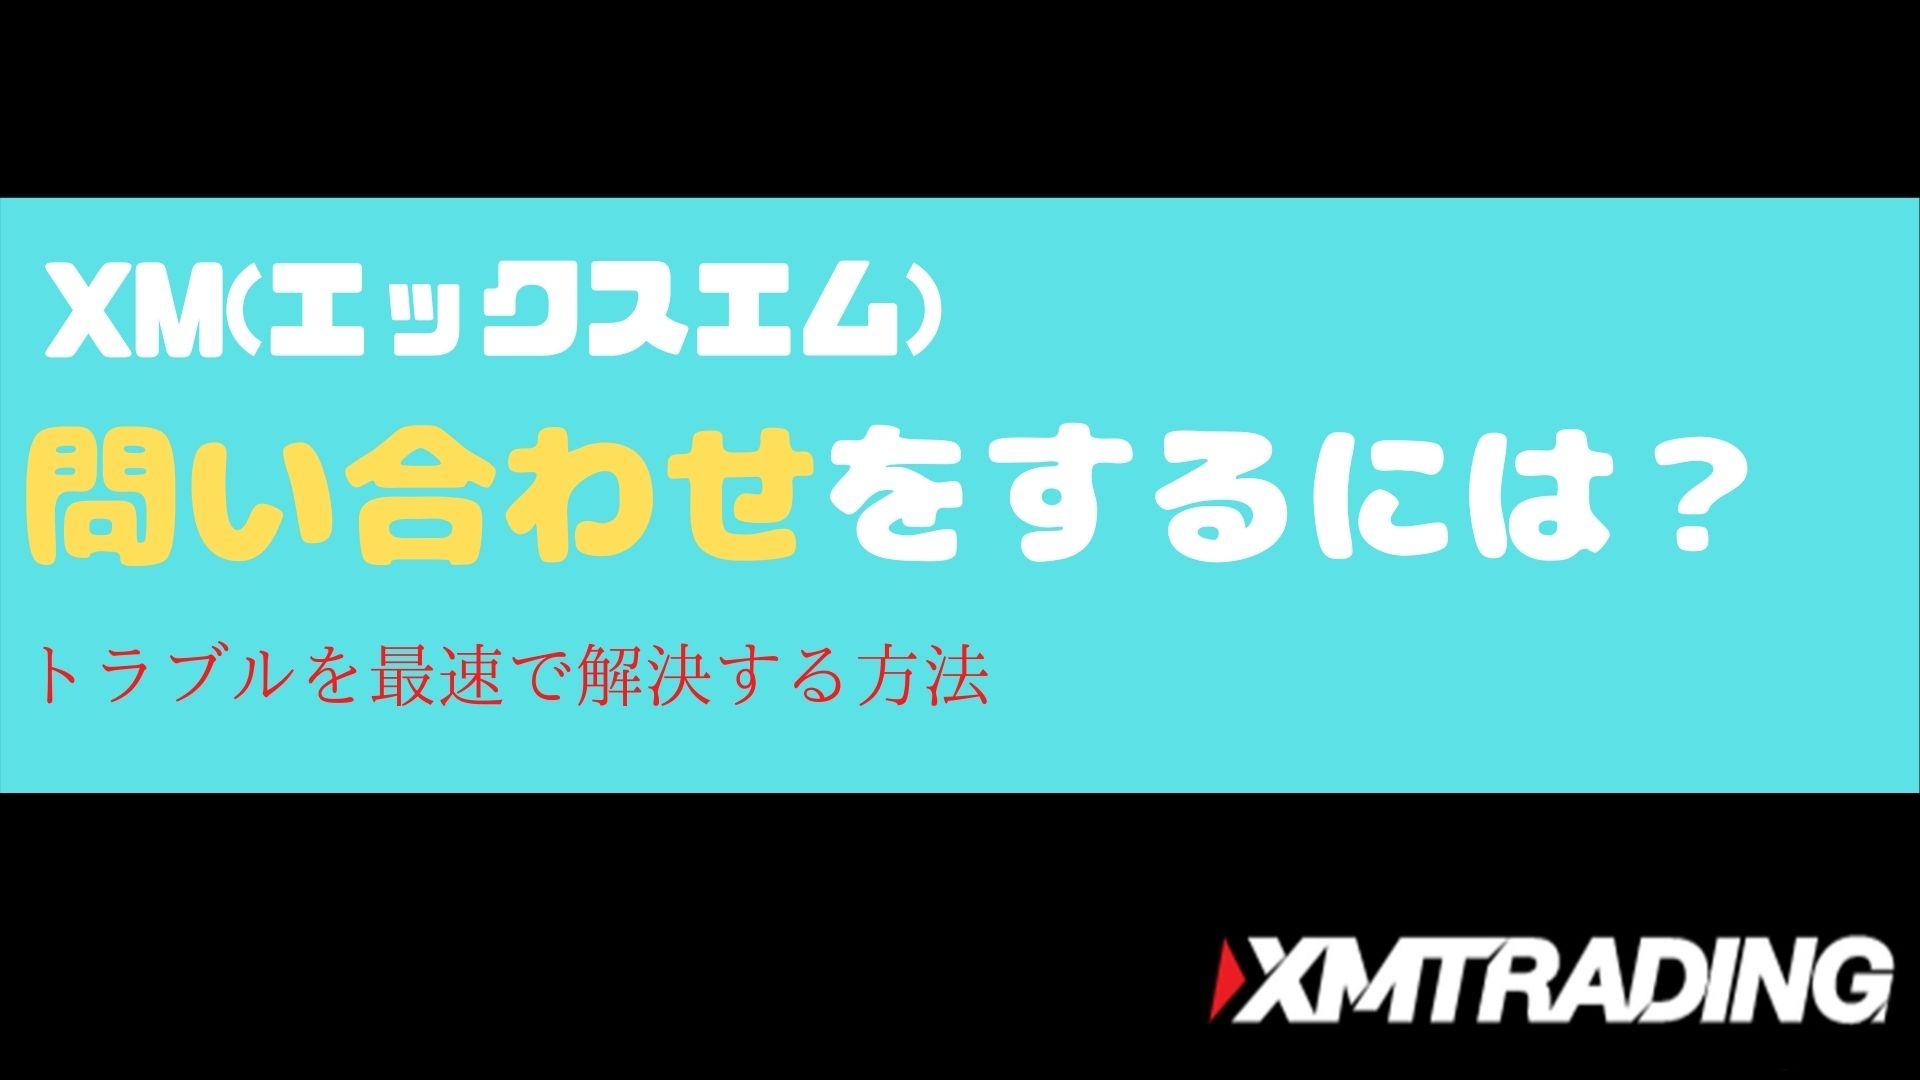 xm-toiawase-title